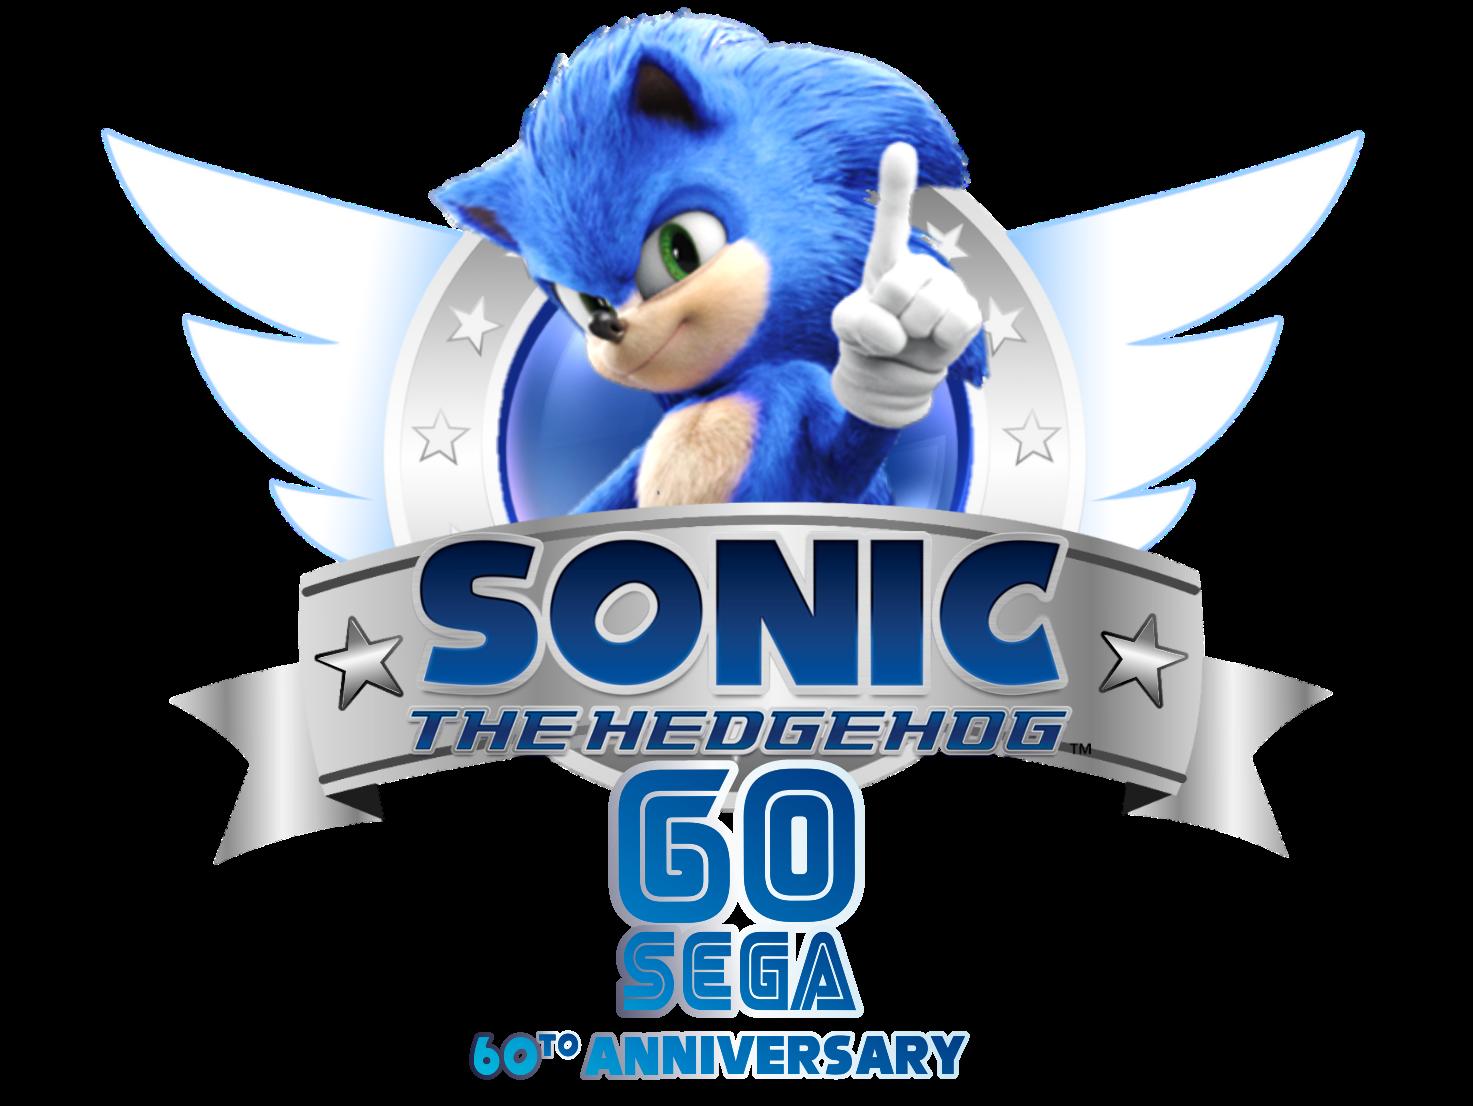 Sega Sonic 60to Anniversary Sonic Sonic The Movie Sonic The Hedgehog